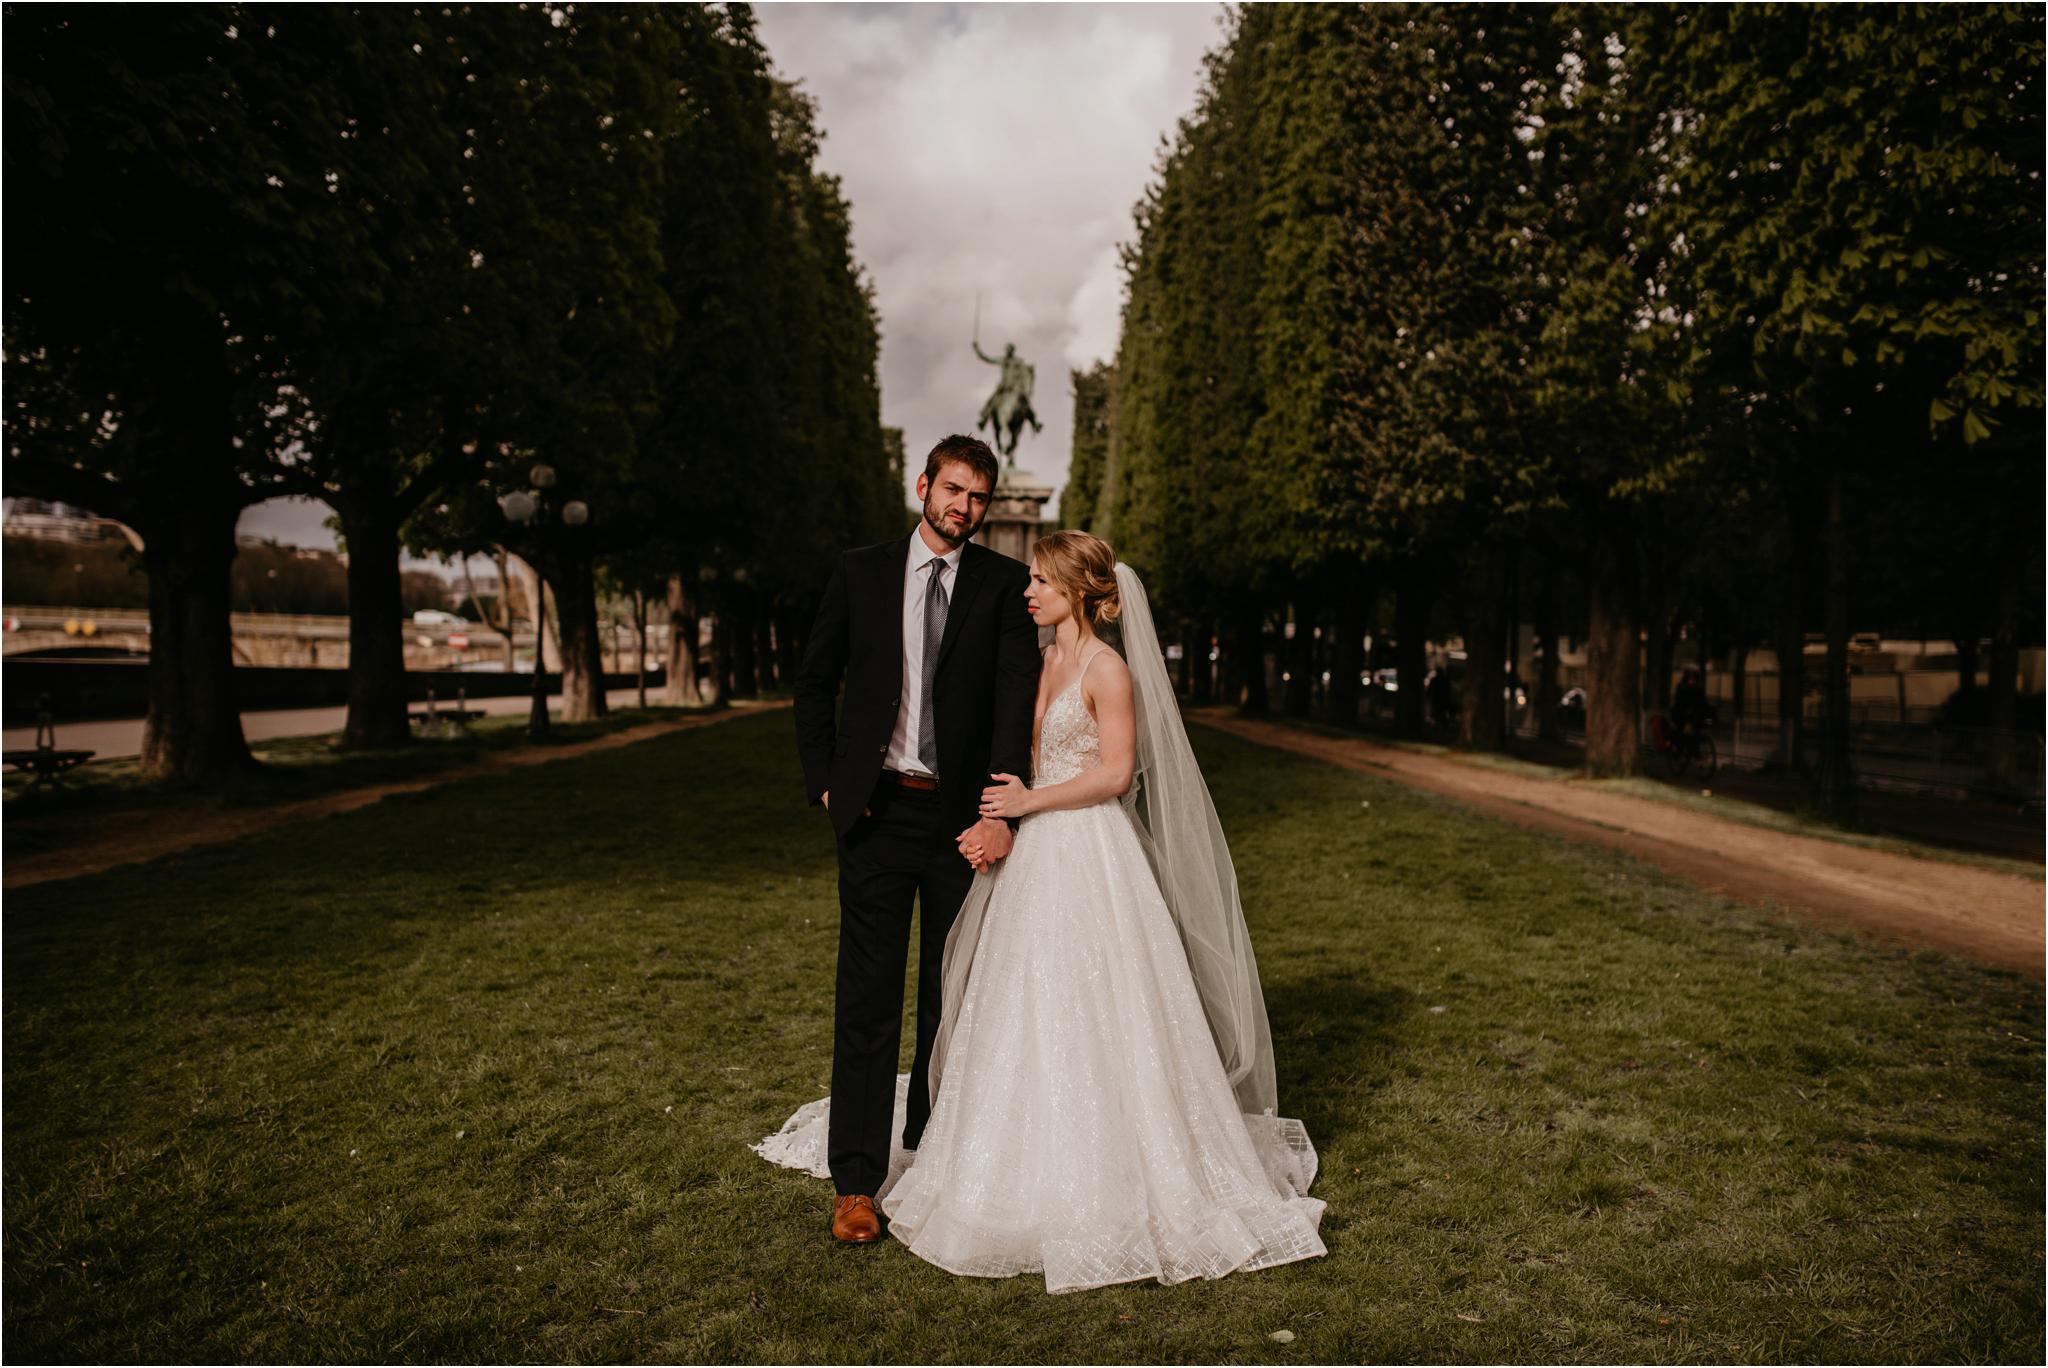 miranda-and-jared-paris-elopement-destination-wedding-photographer-045.jpg